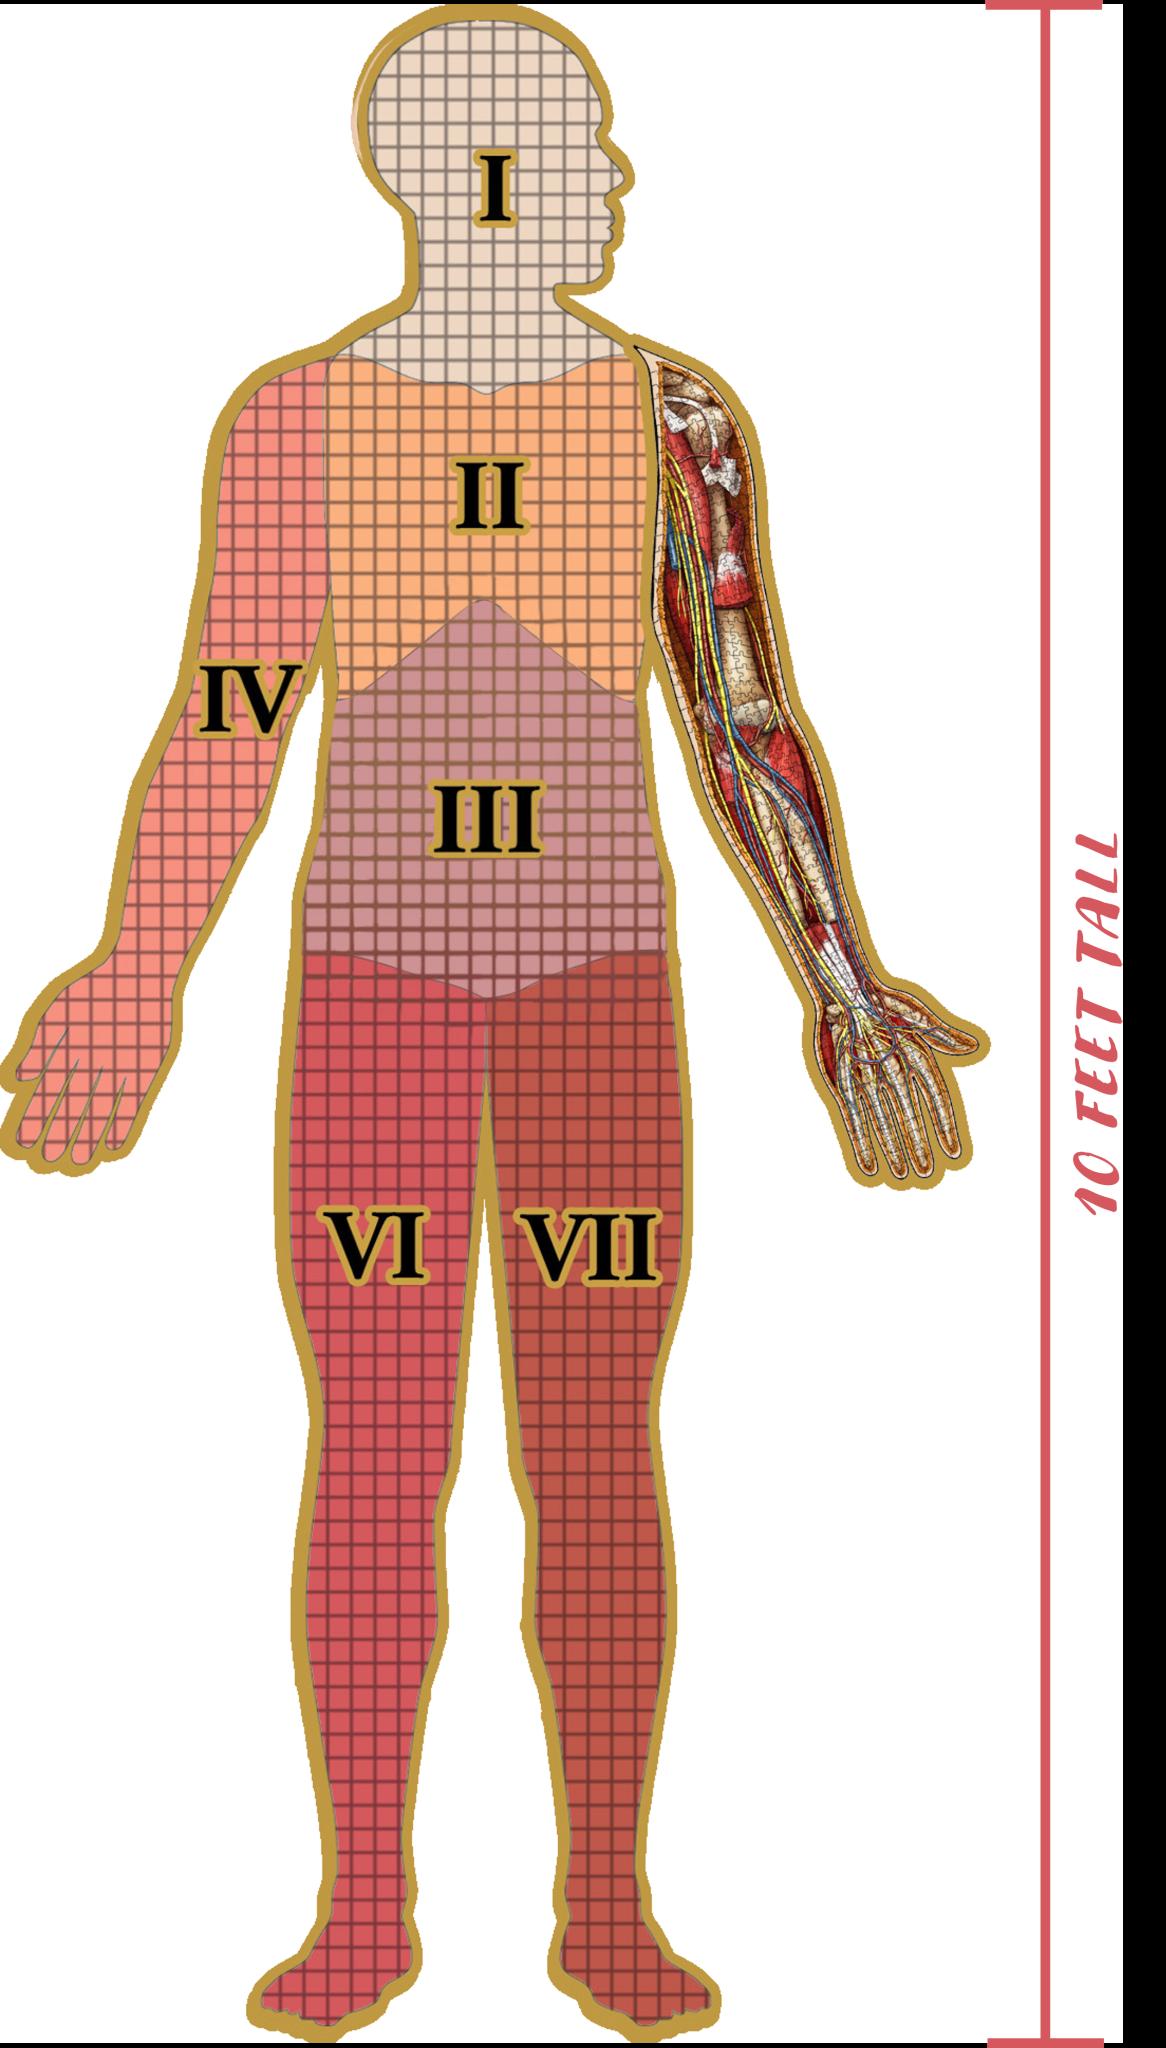 479 - Dr. Livingston's Anatomy Jigsaw Puzzles Volume V - Human Left Arm